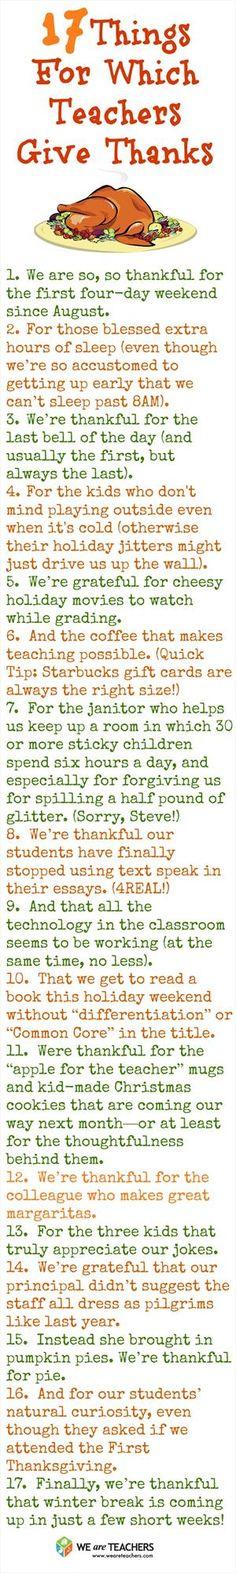 Reasons teachers are thankful! #weareteachers  @Wendy Chiabotta-Cieslak @Melanie Anderson